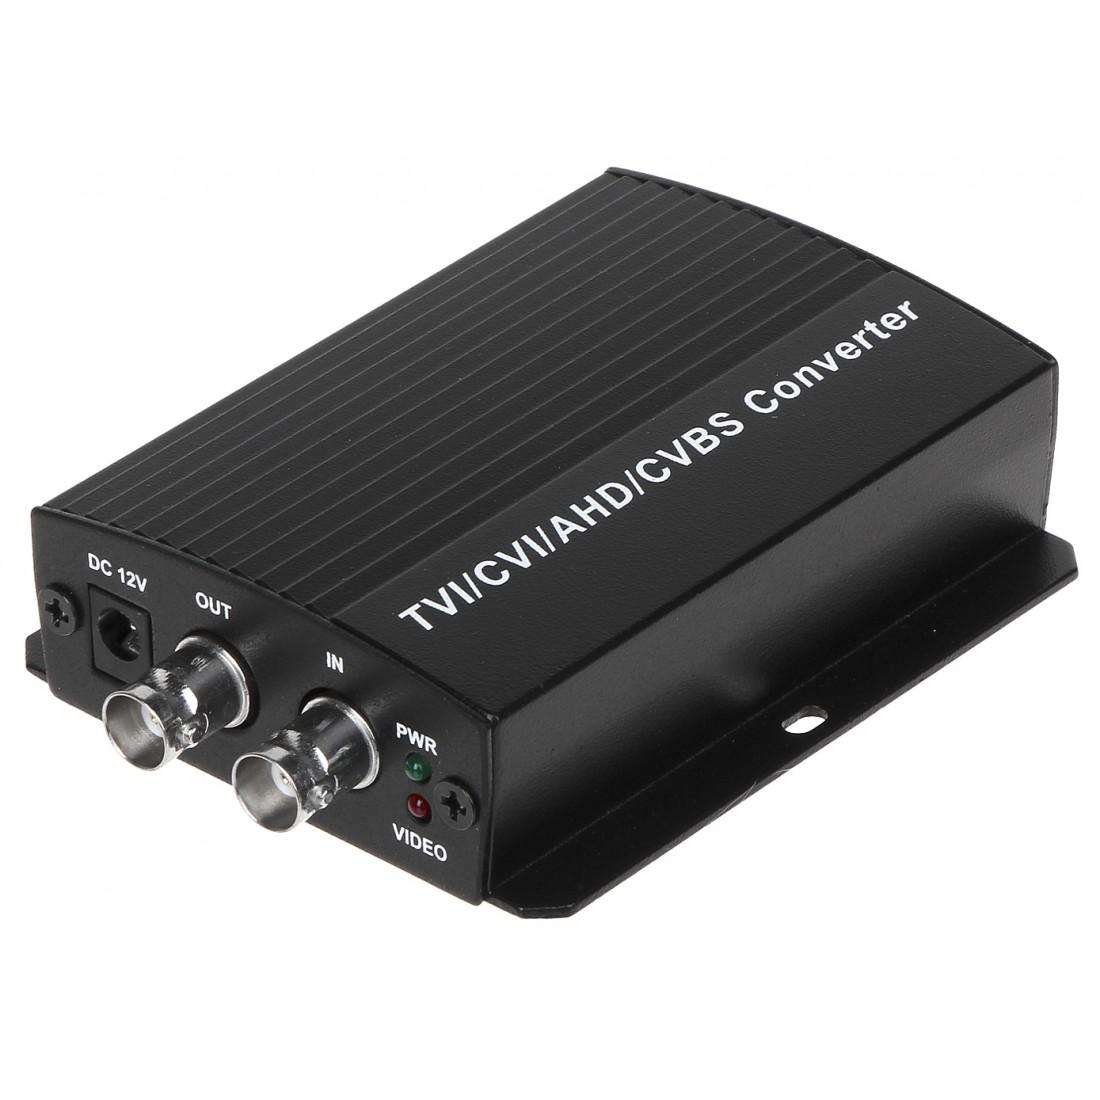 MENIC HV/HDMI+HV